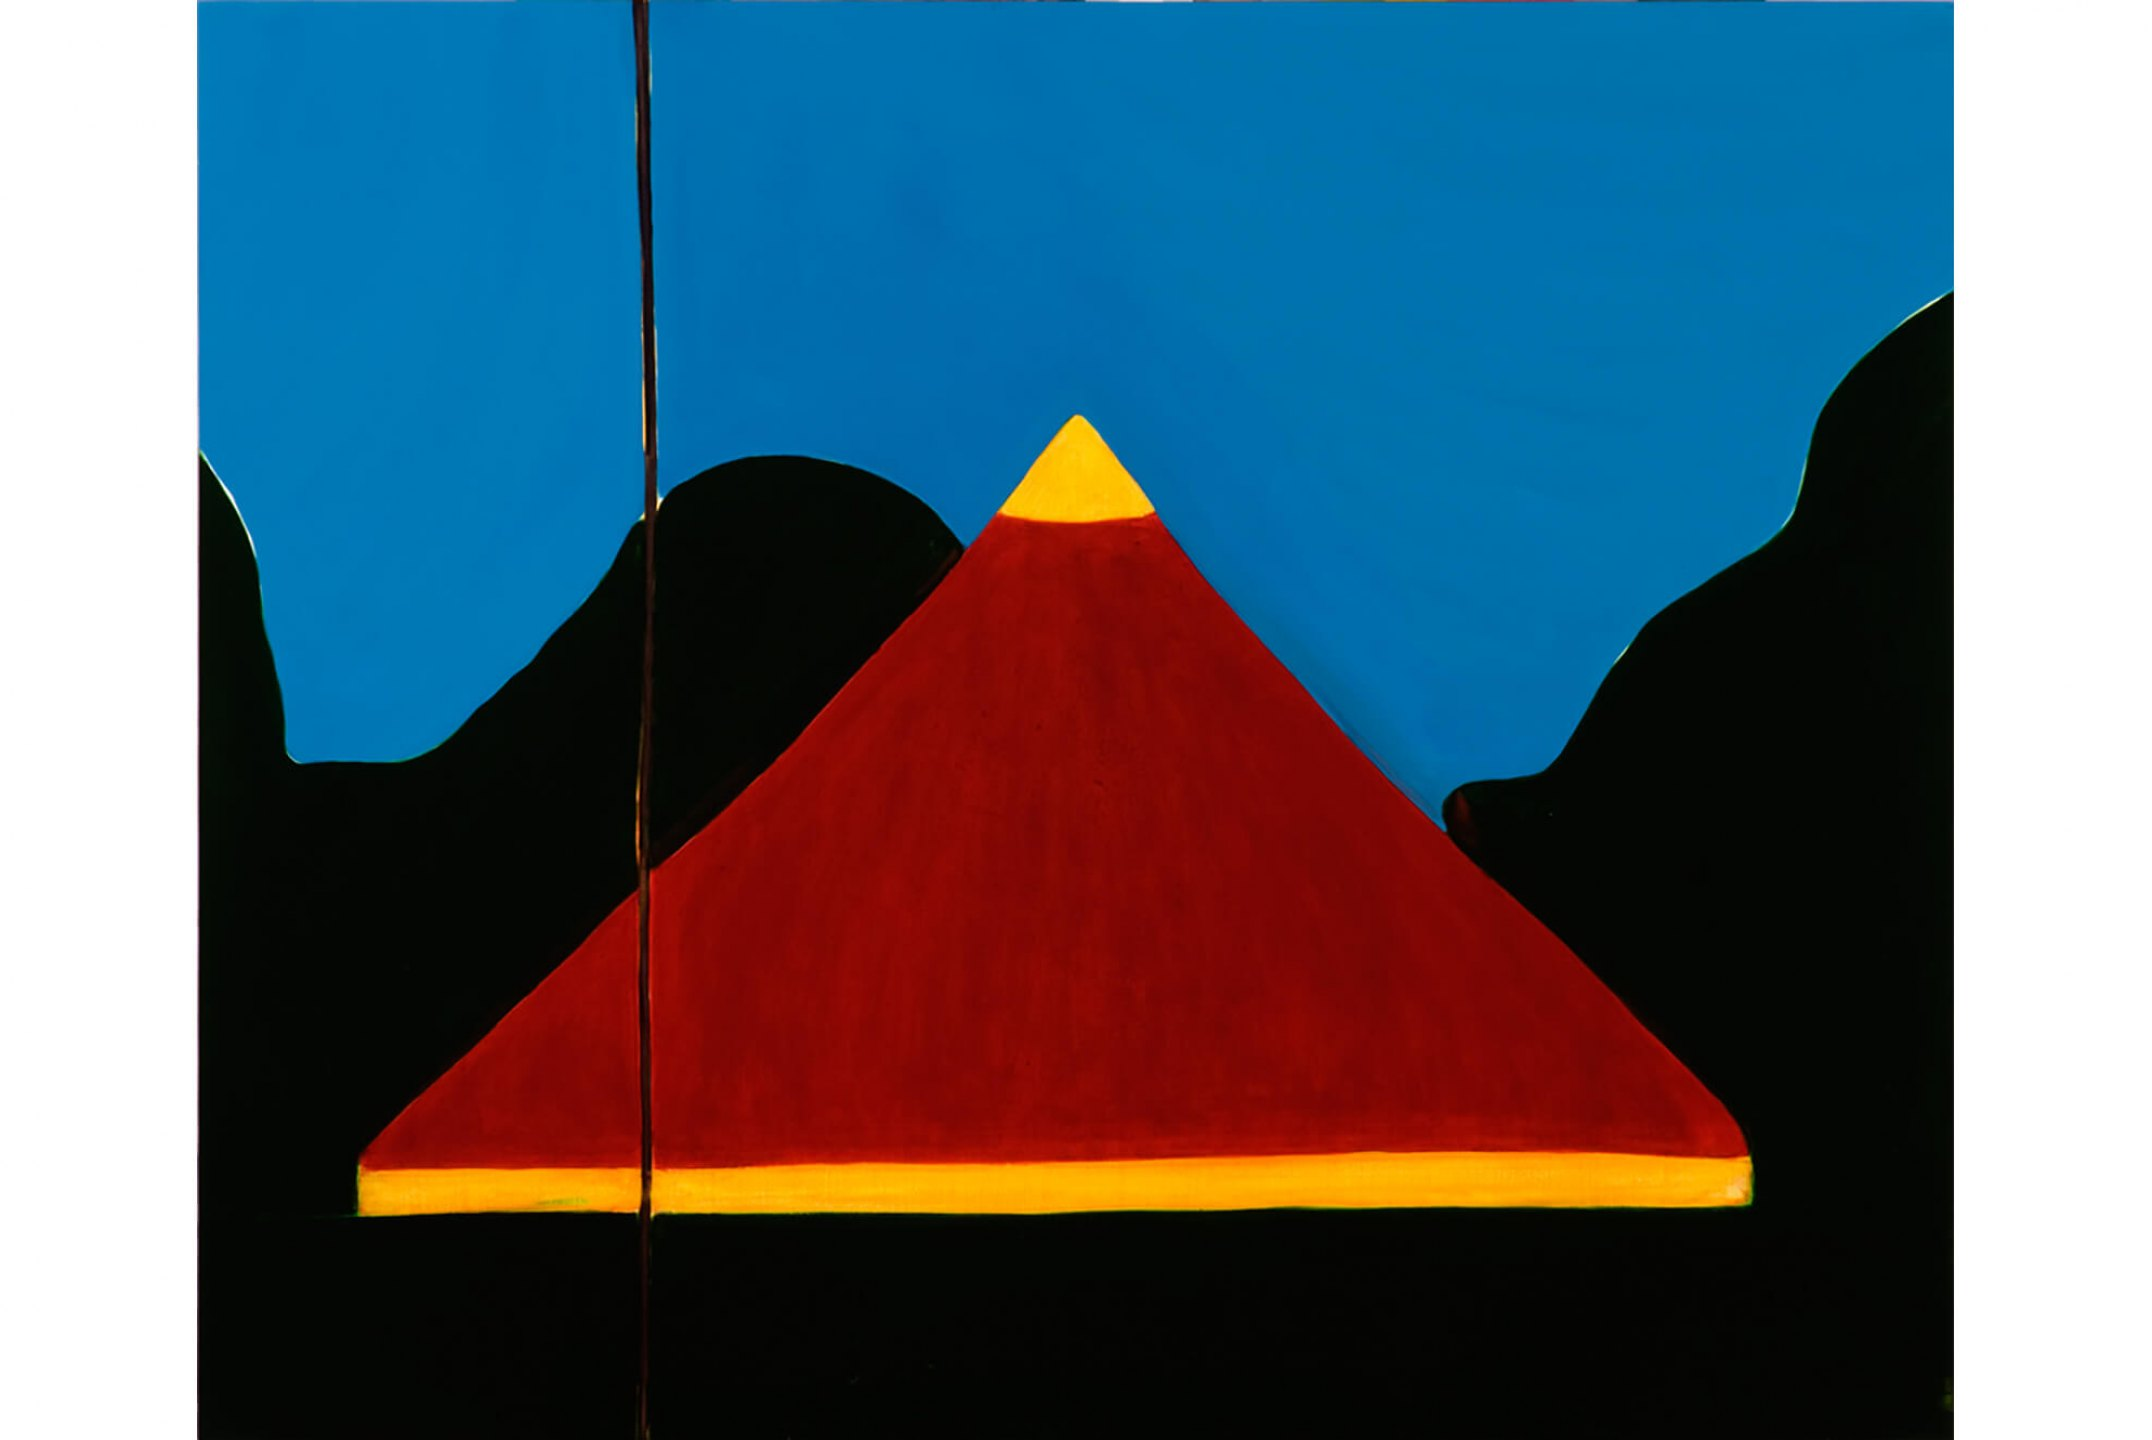 Patricia Leite,&nbsp;<em>Untitled (Li Canvas),</em>&nbsp;2009, oil on wood, 90 ×&nbsp;110 cm - Mendes Wood DM